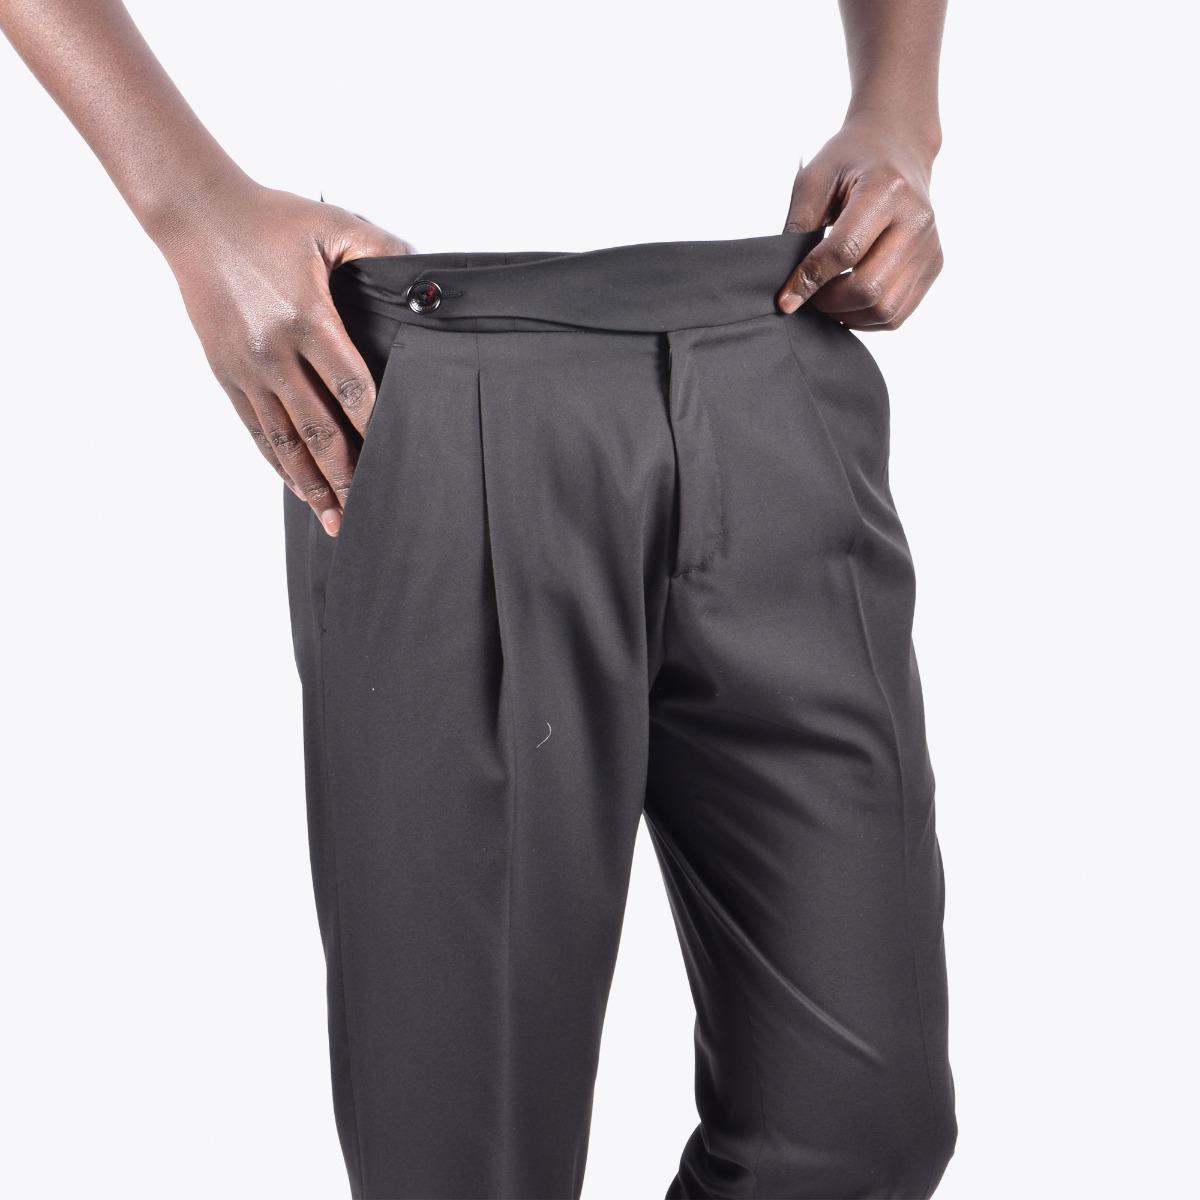 Pantaloni fascia vita e bottone - Nero